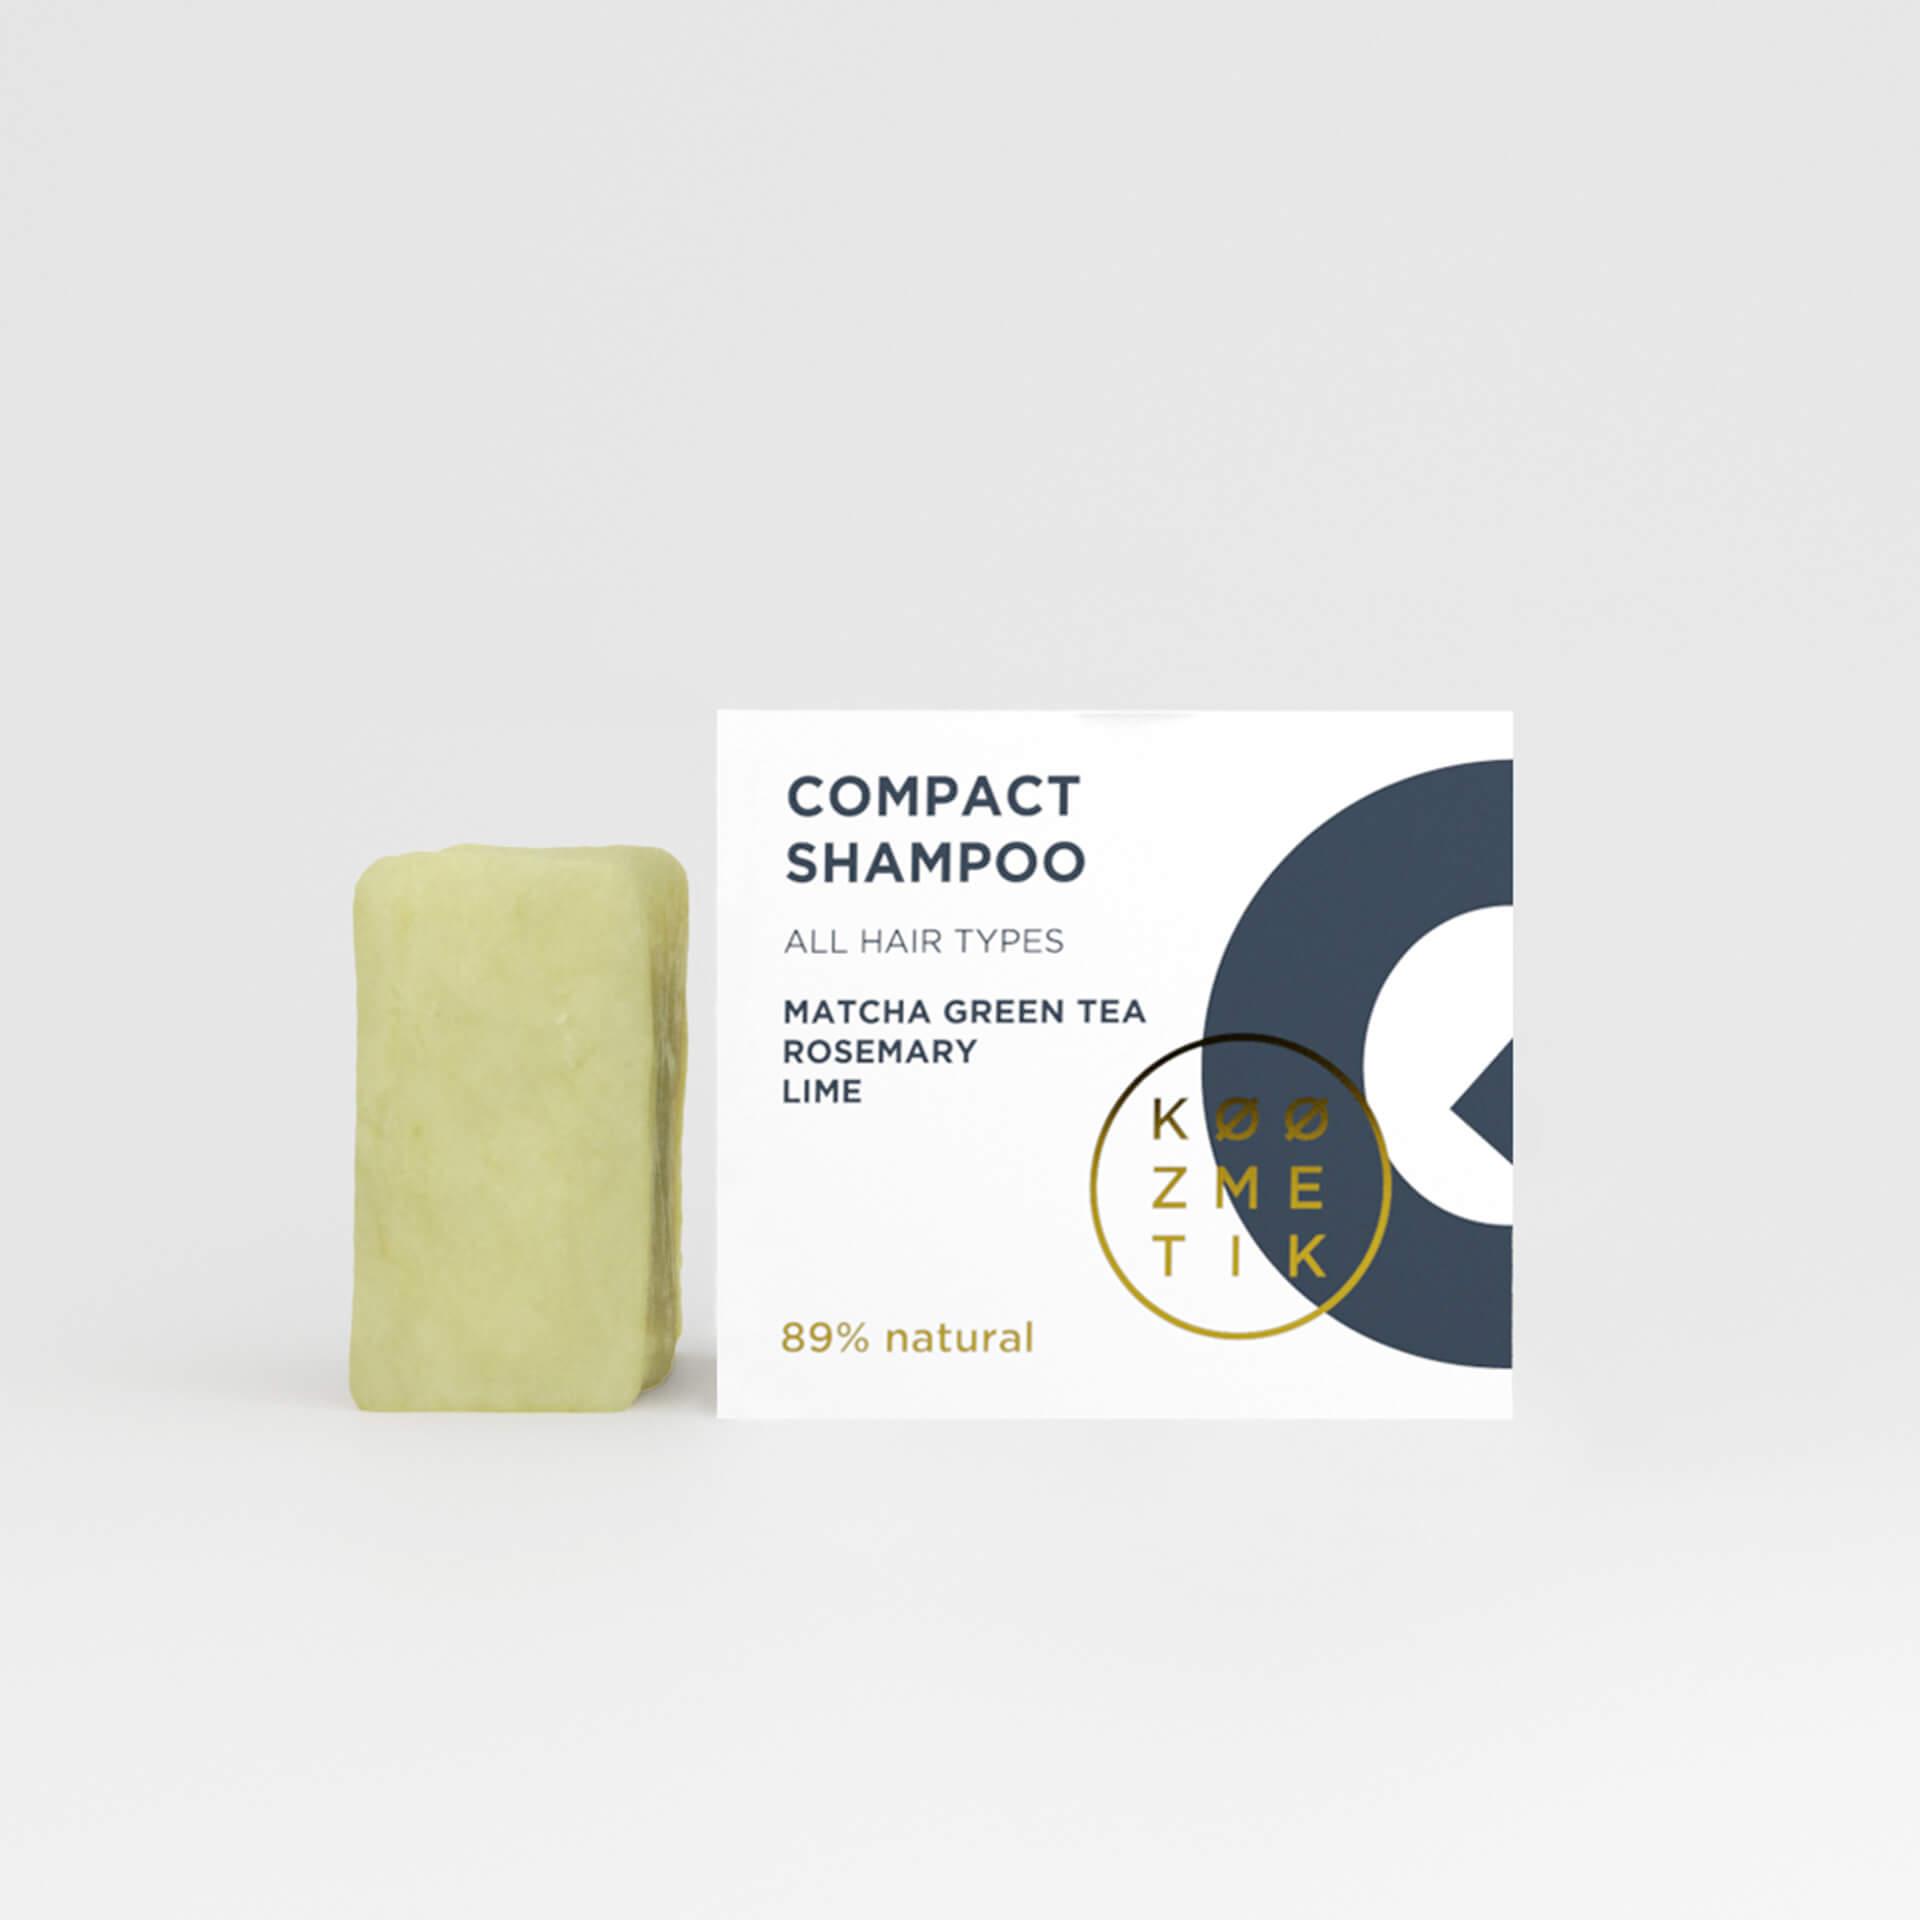 Compact shampoo Q